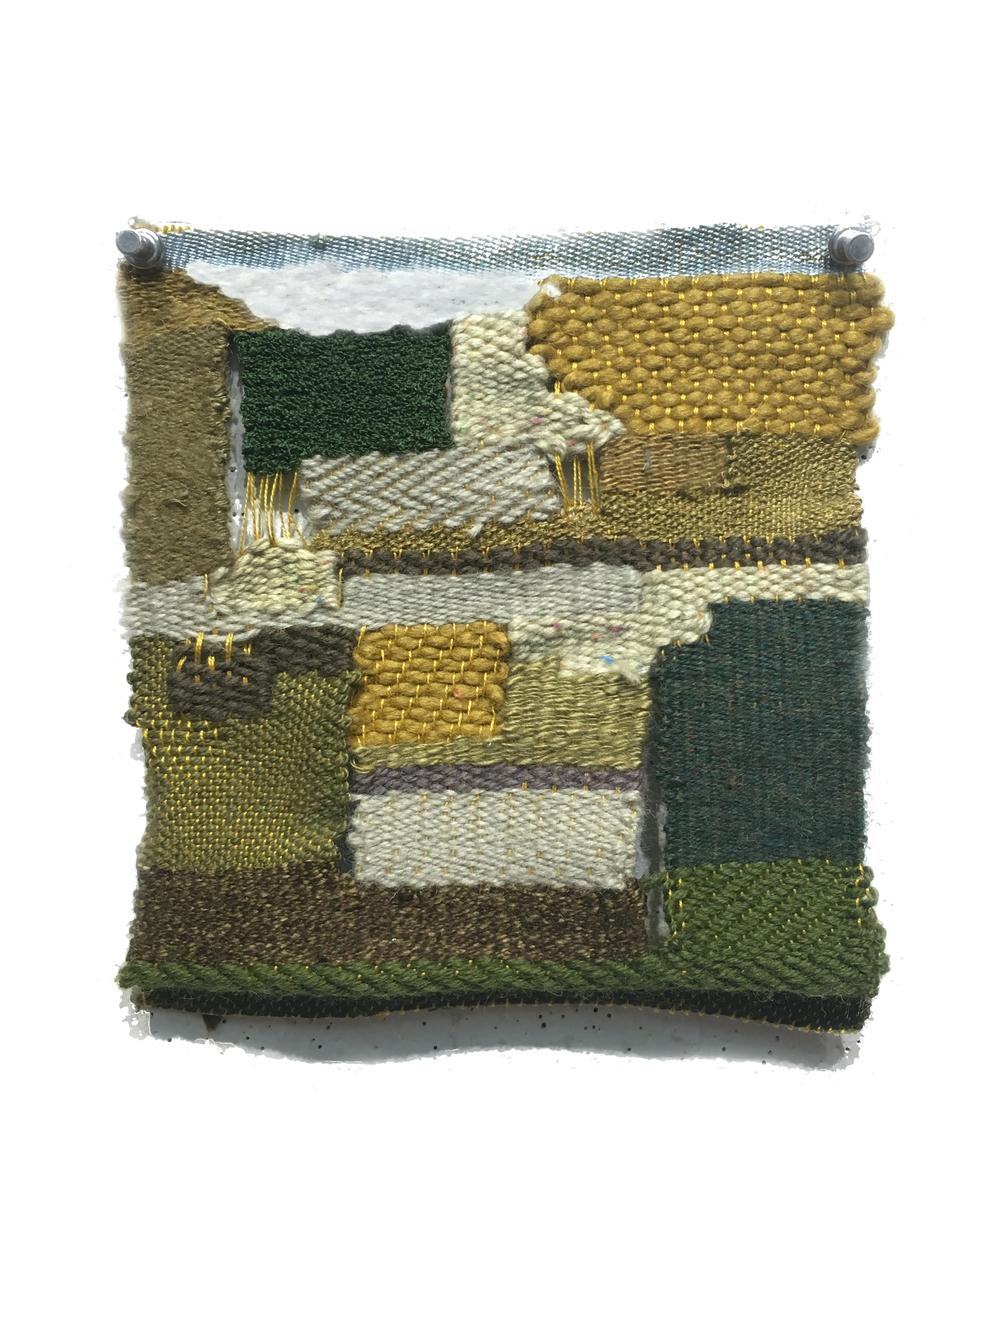 weaving1sample10.jpg